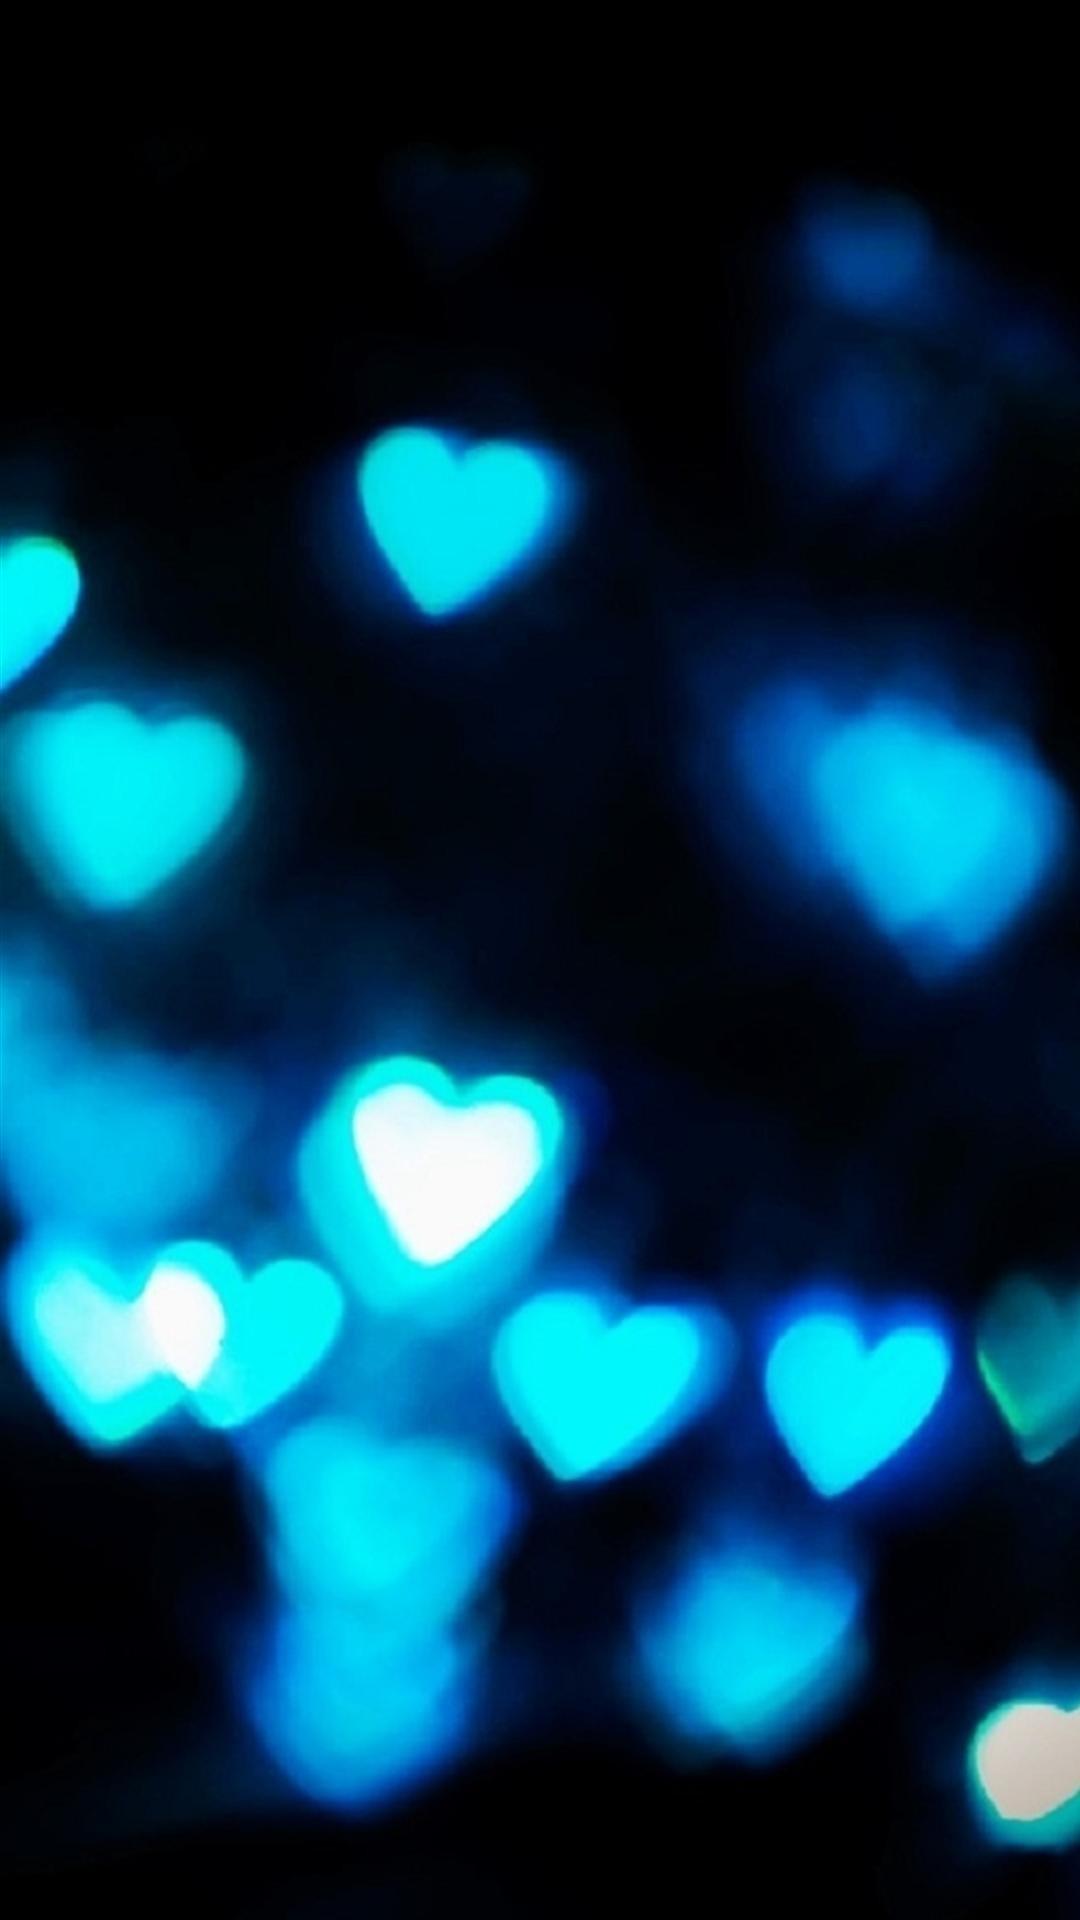 Htc One M8 Wallpaper Hd Blue Hearts Wallpaper 183 ①